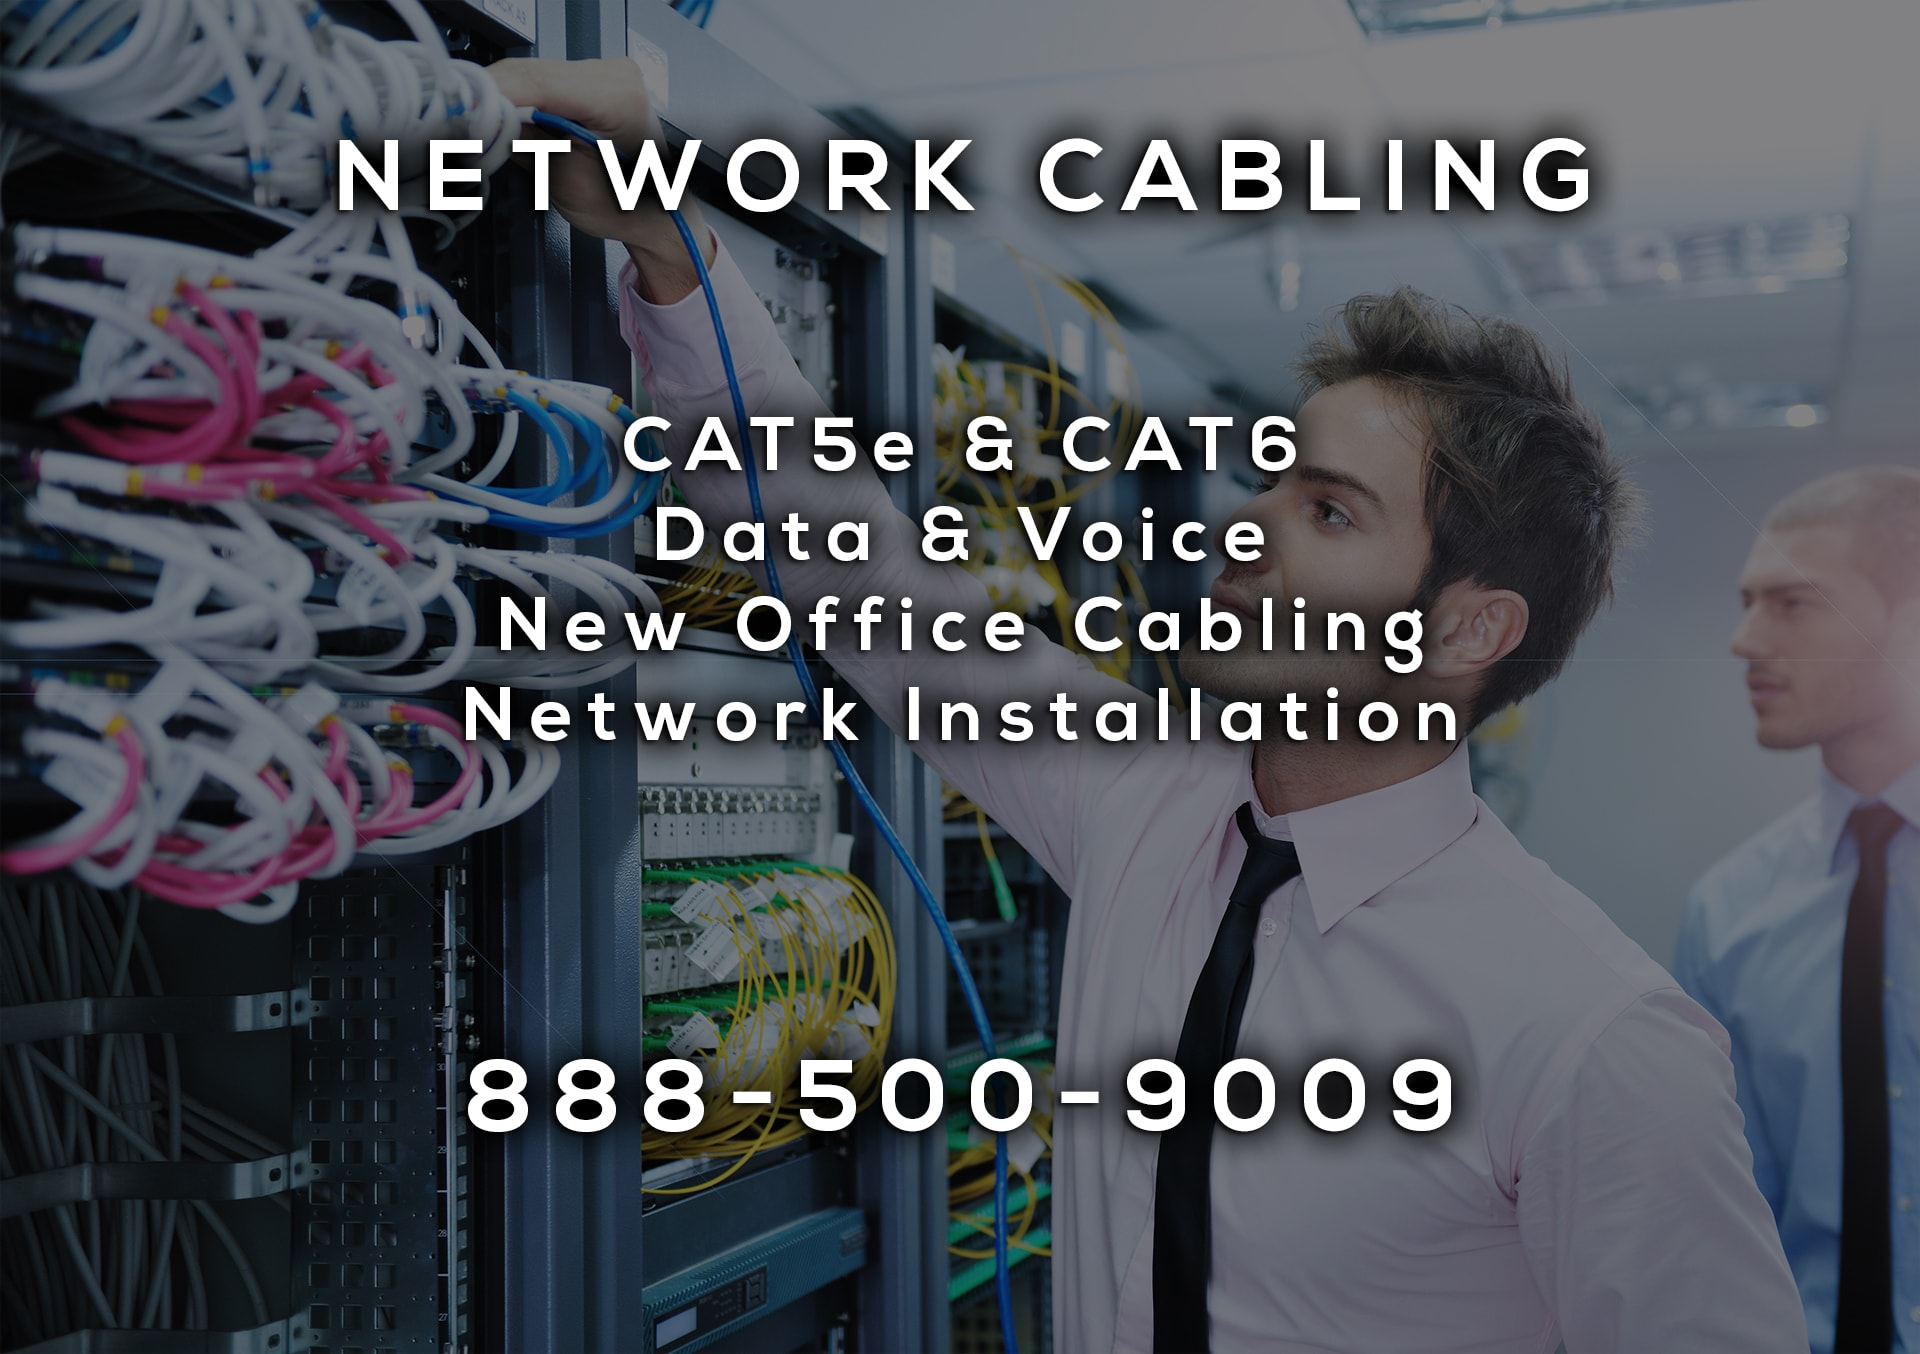 Network Cabling in Coachella CA